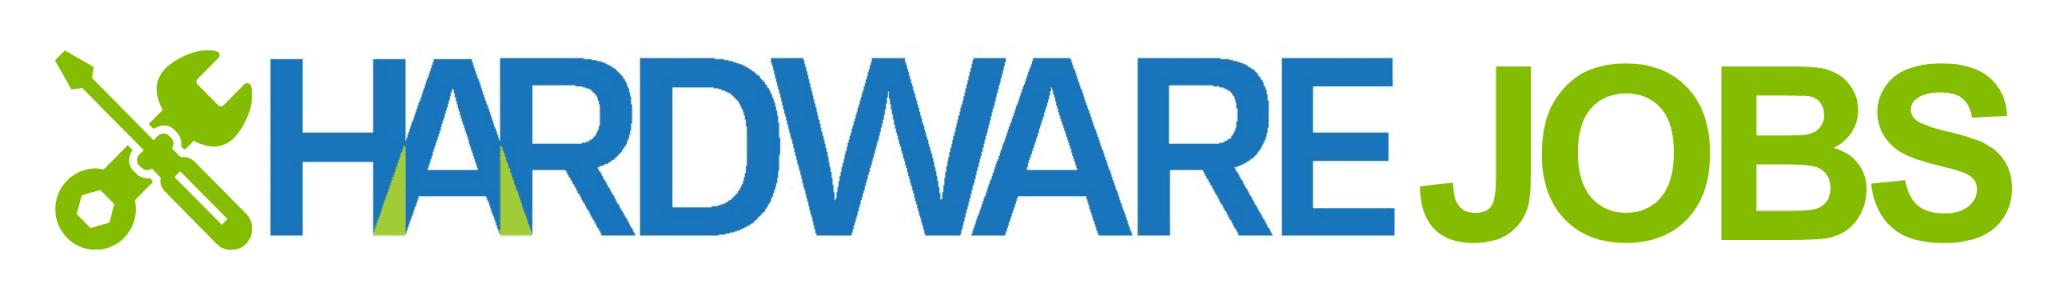 Hardware Jobs logo